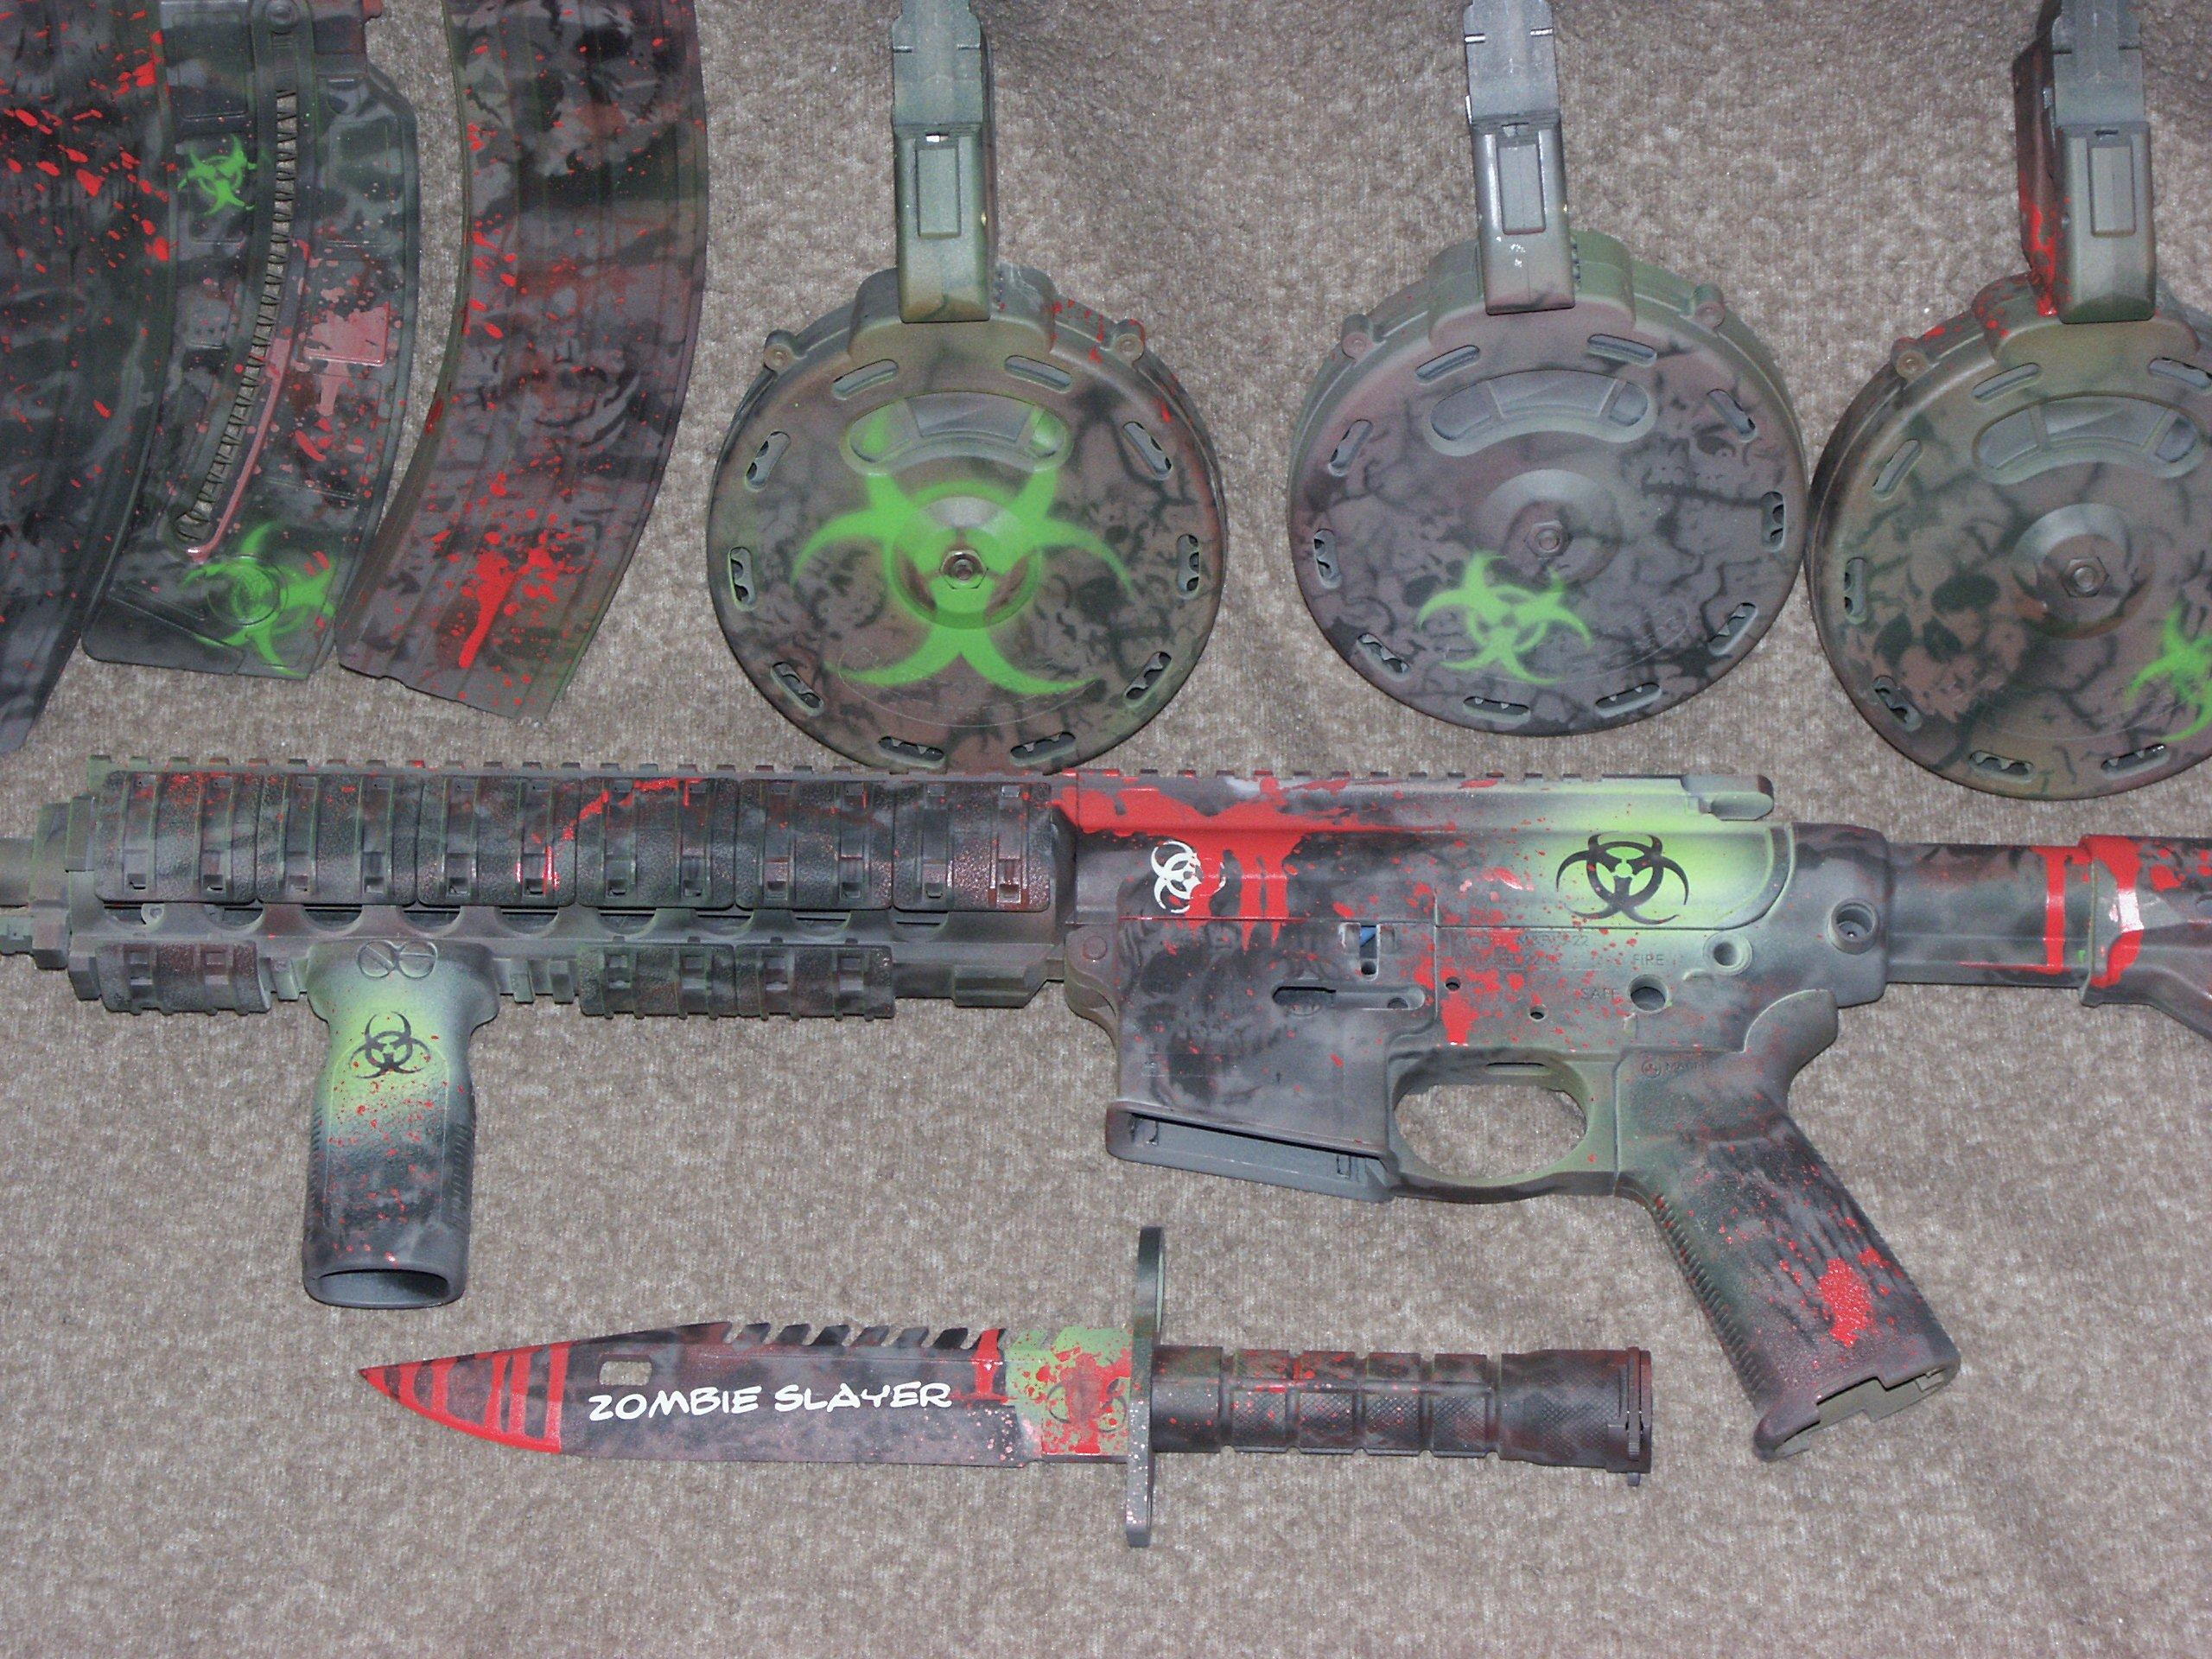 M&P Zombie CamouflAGE